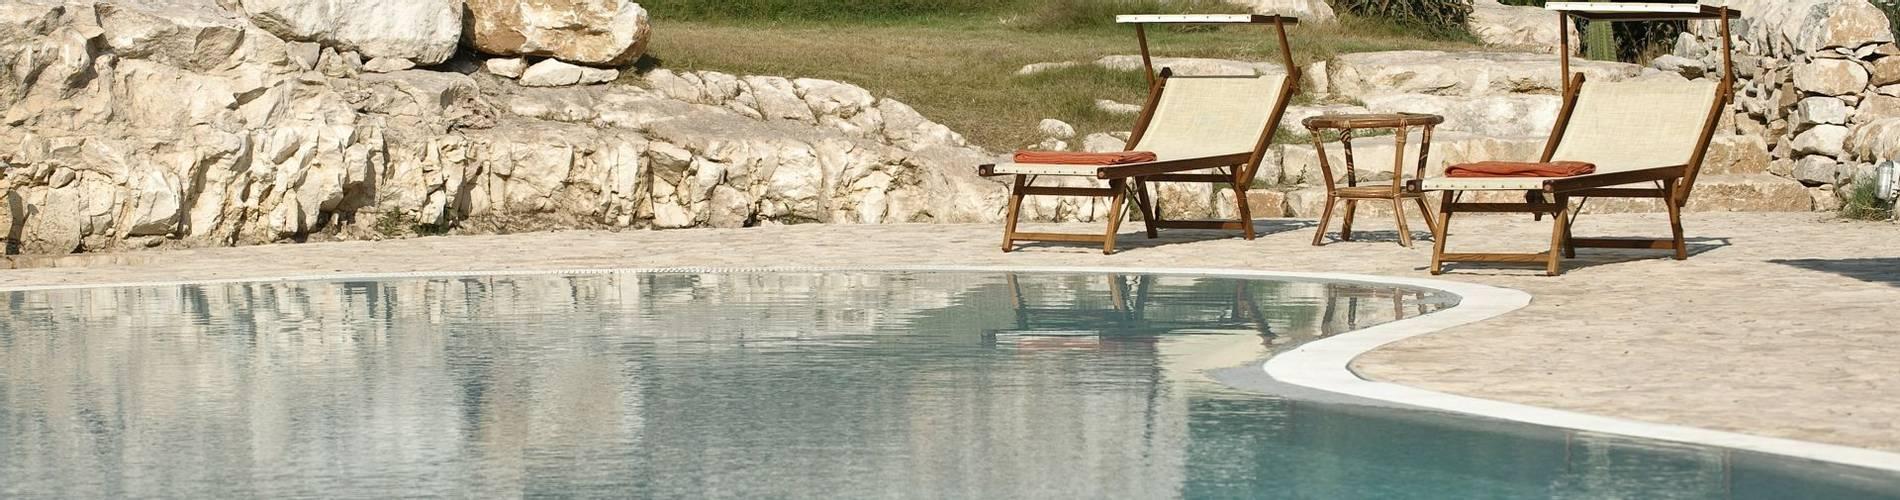 Parco Cavalonga, Sicily, Italy (20).jpg